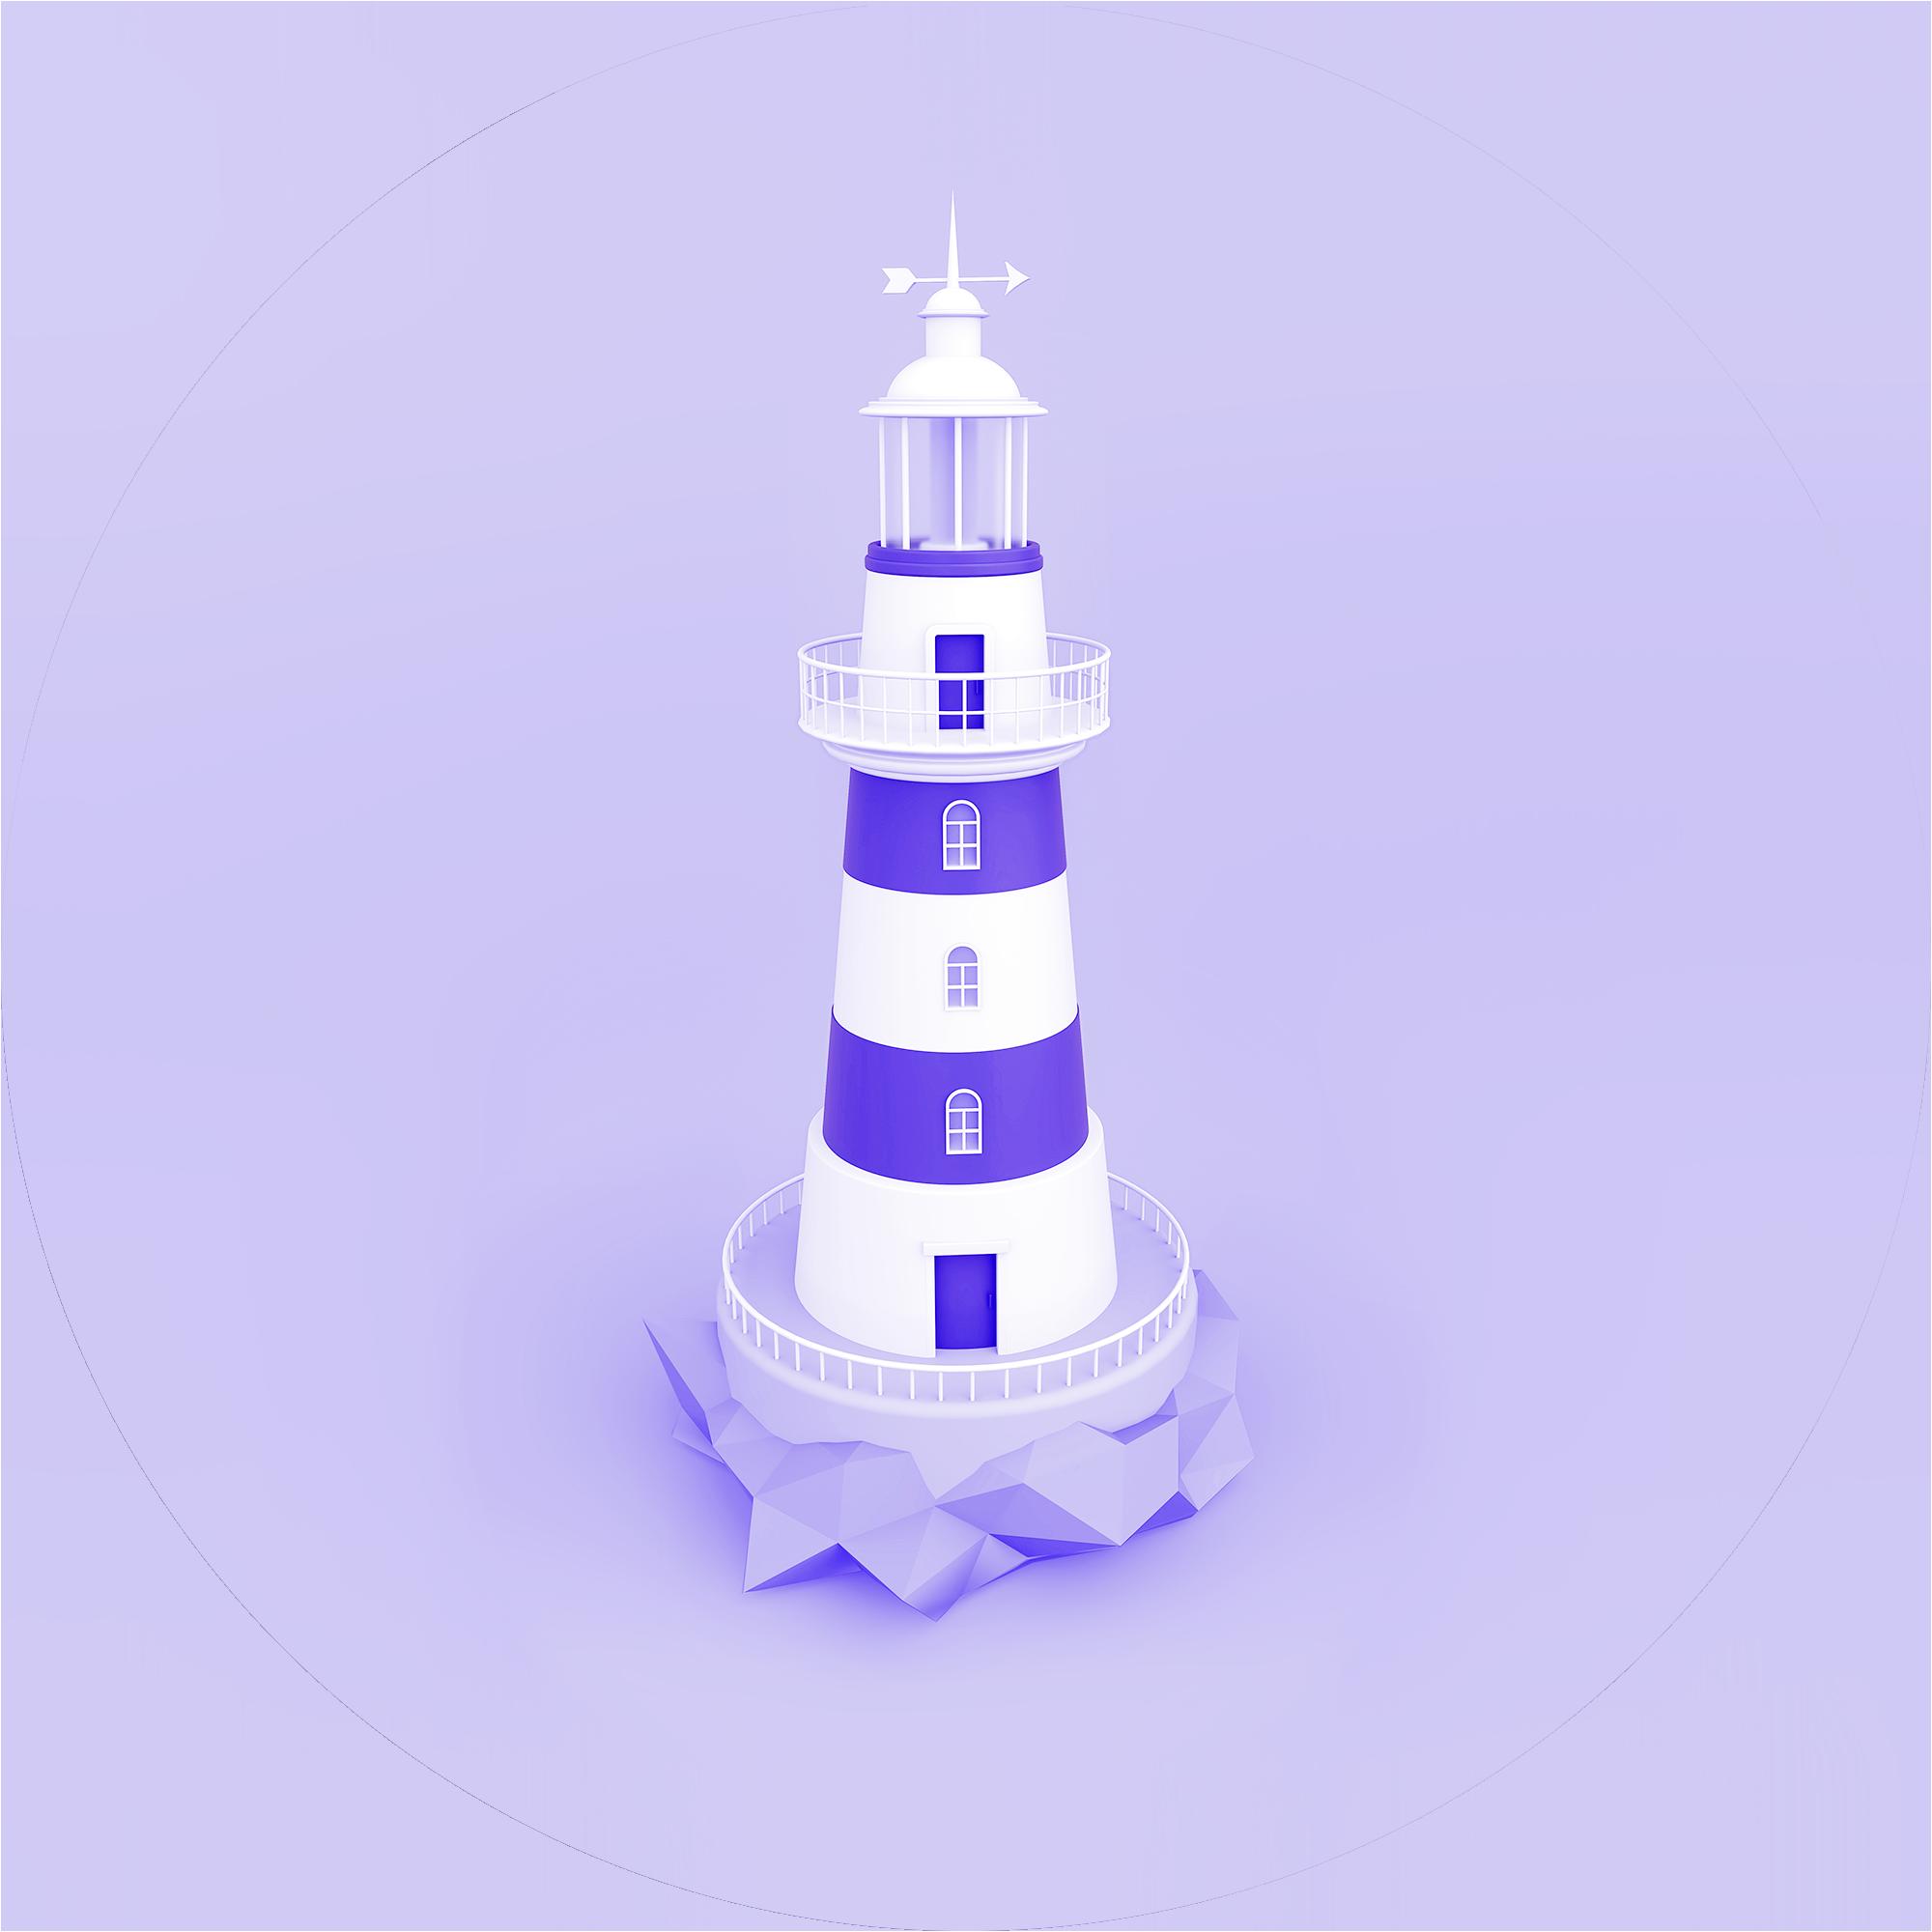 Careers hero image of lighthouse